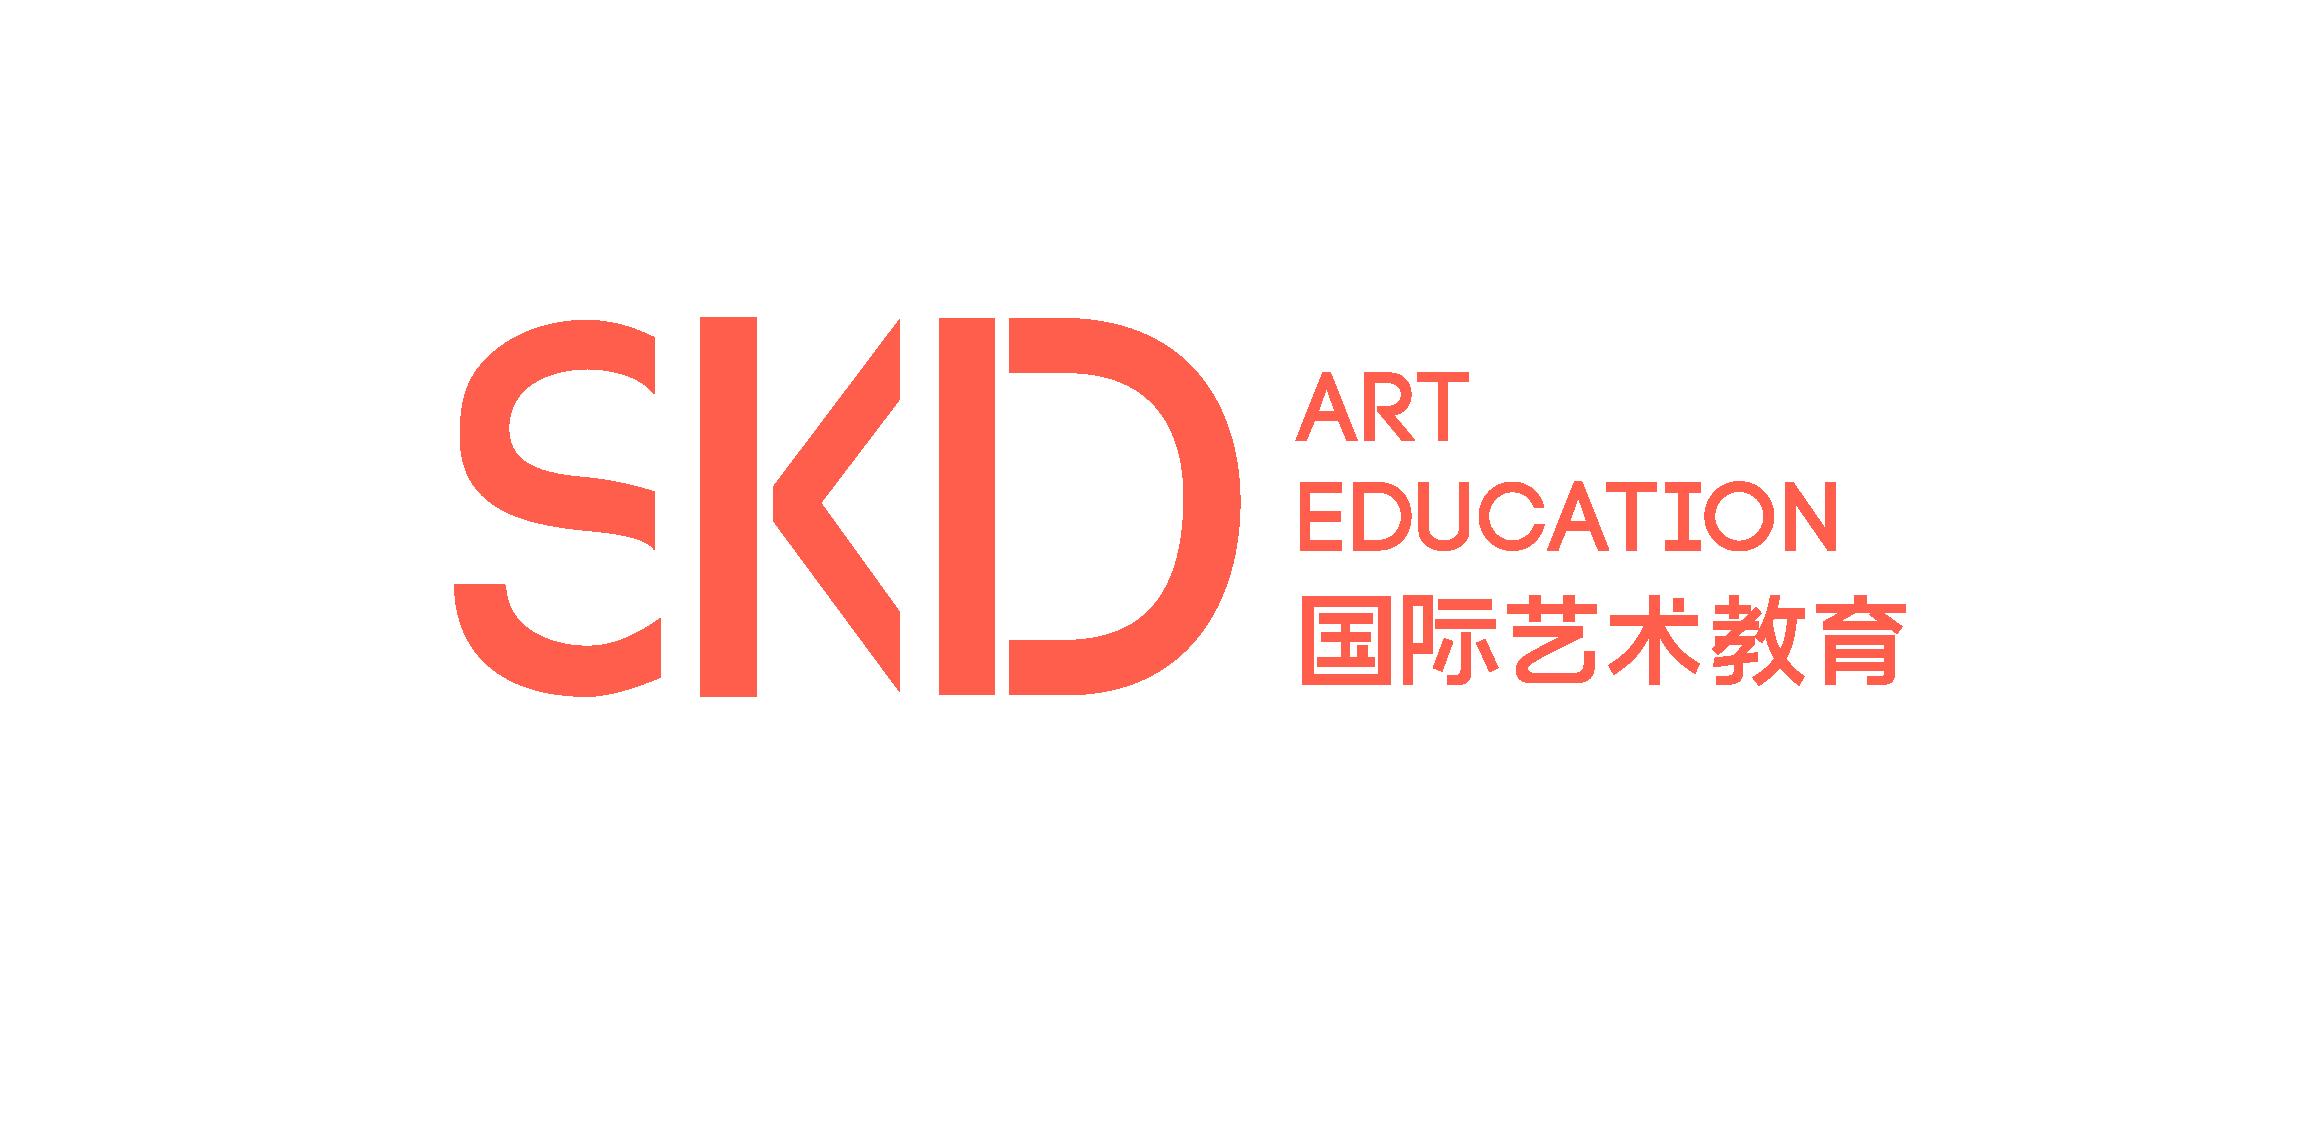 SKD国际艺术教育大连分公司